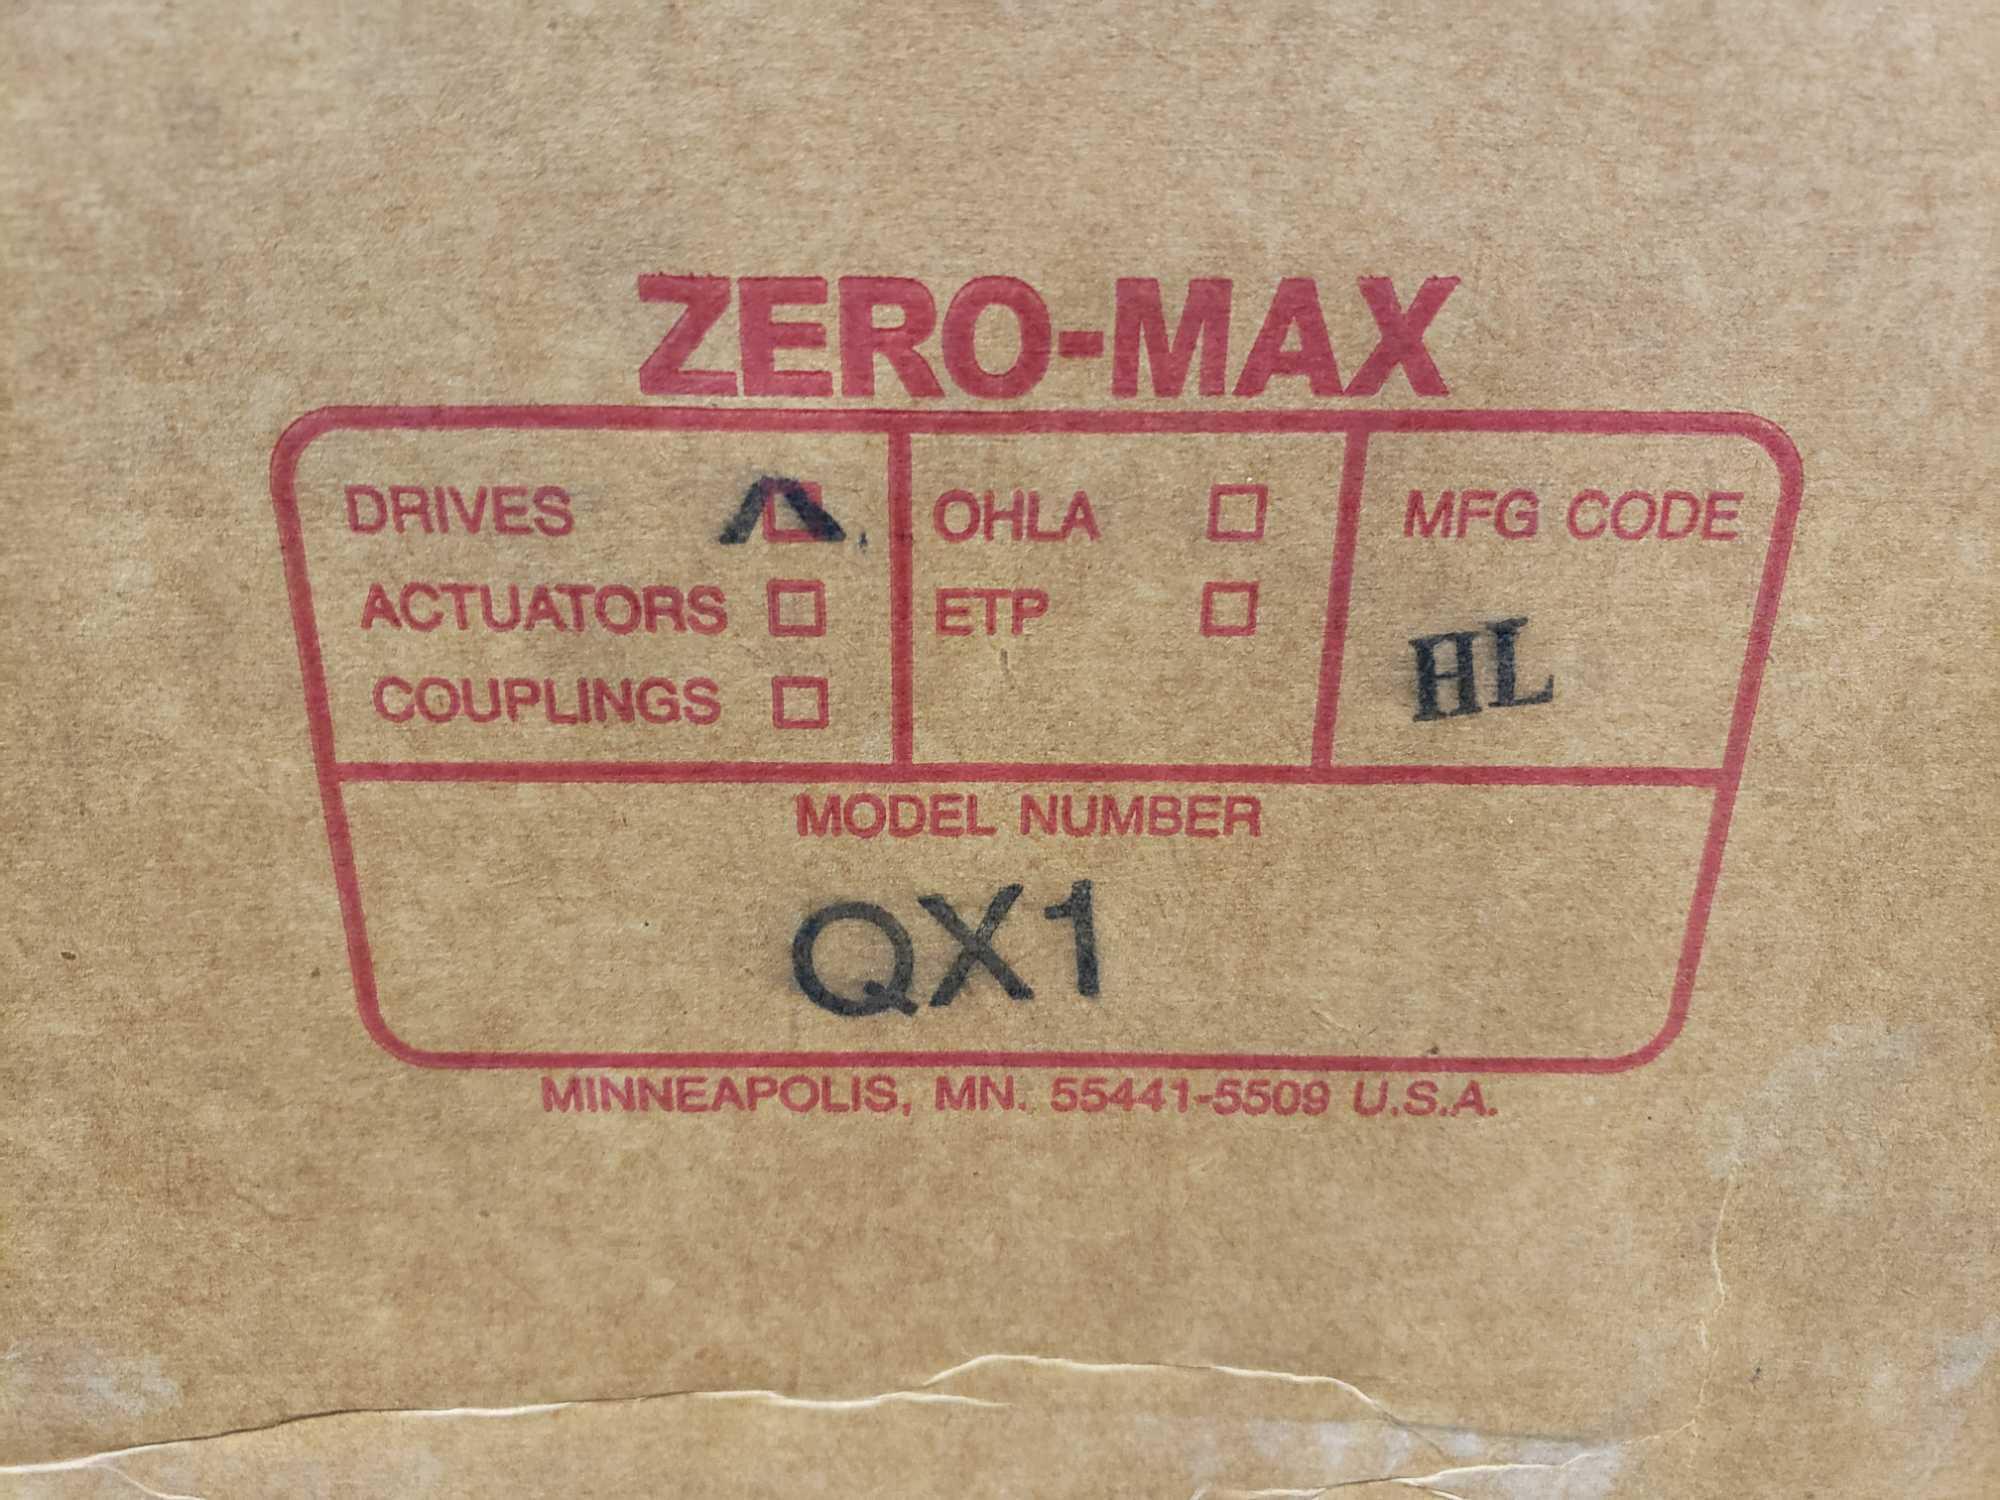 Zero-max drive power block model QX1 CCW output rotation, 100lb torque, 0-400 speed range. New. - Image 3 of 3